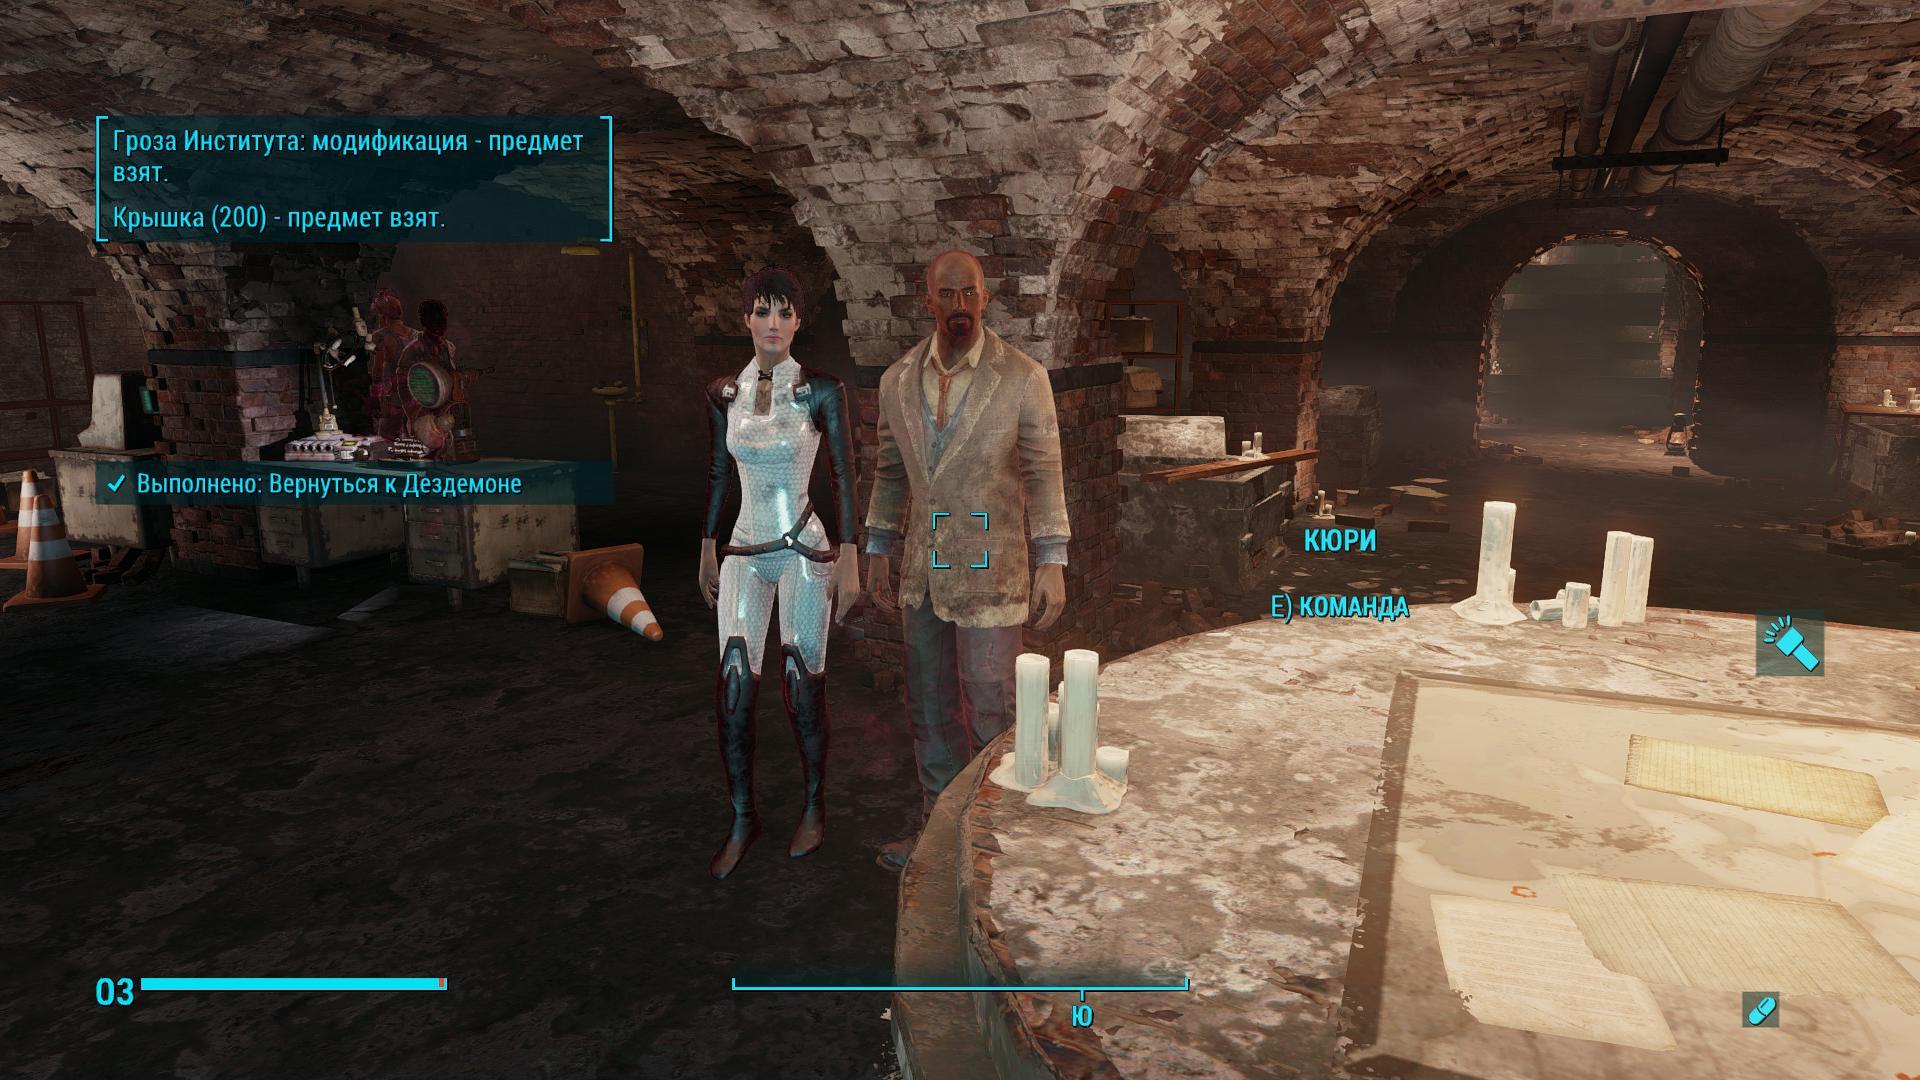 000568.Jpg - Fallout 4